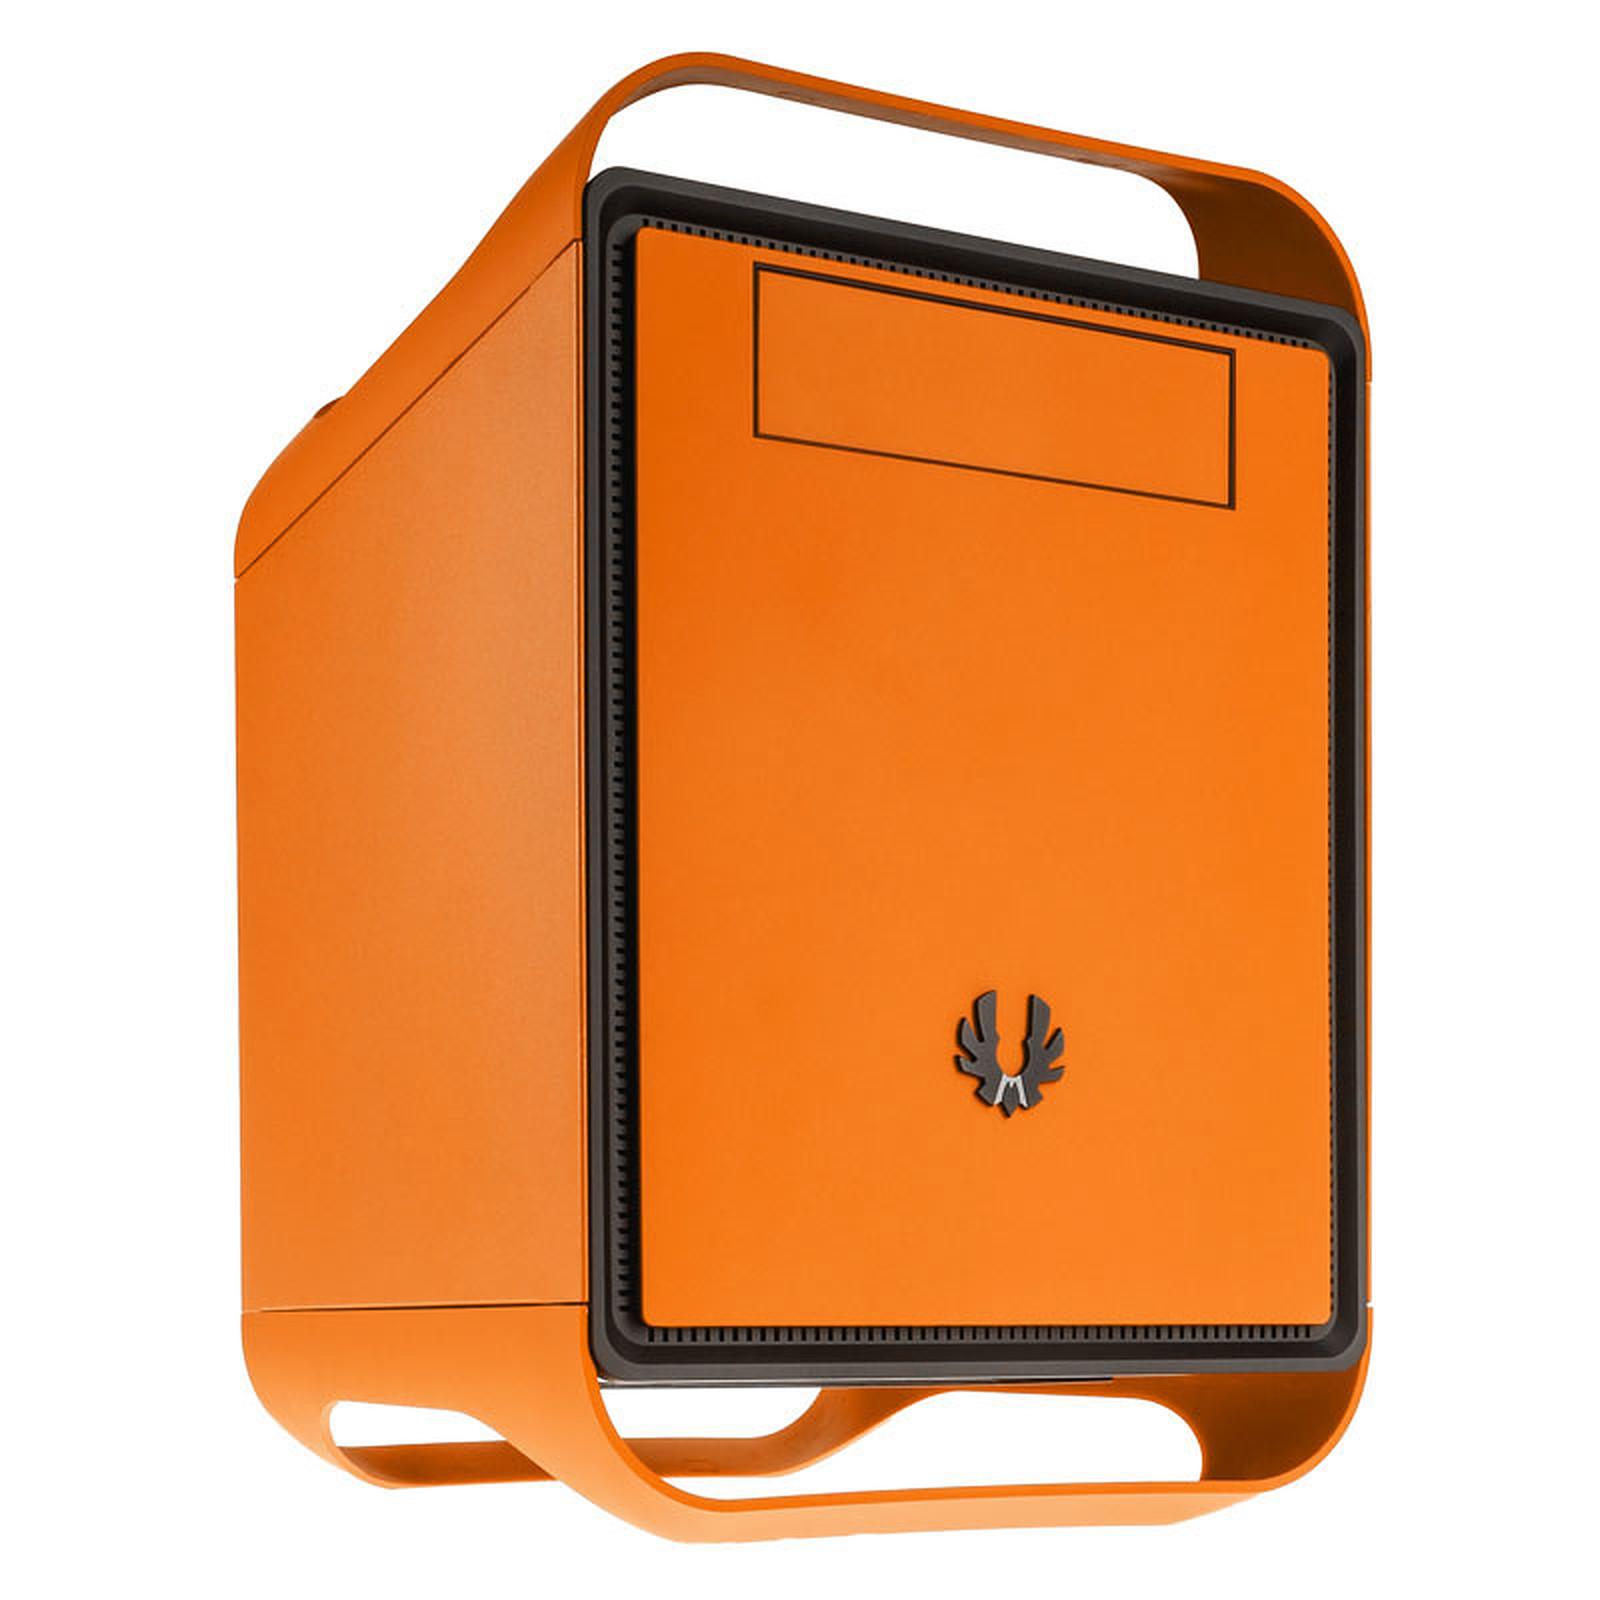 BitFenix Prodigy M (orange)